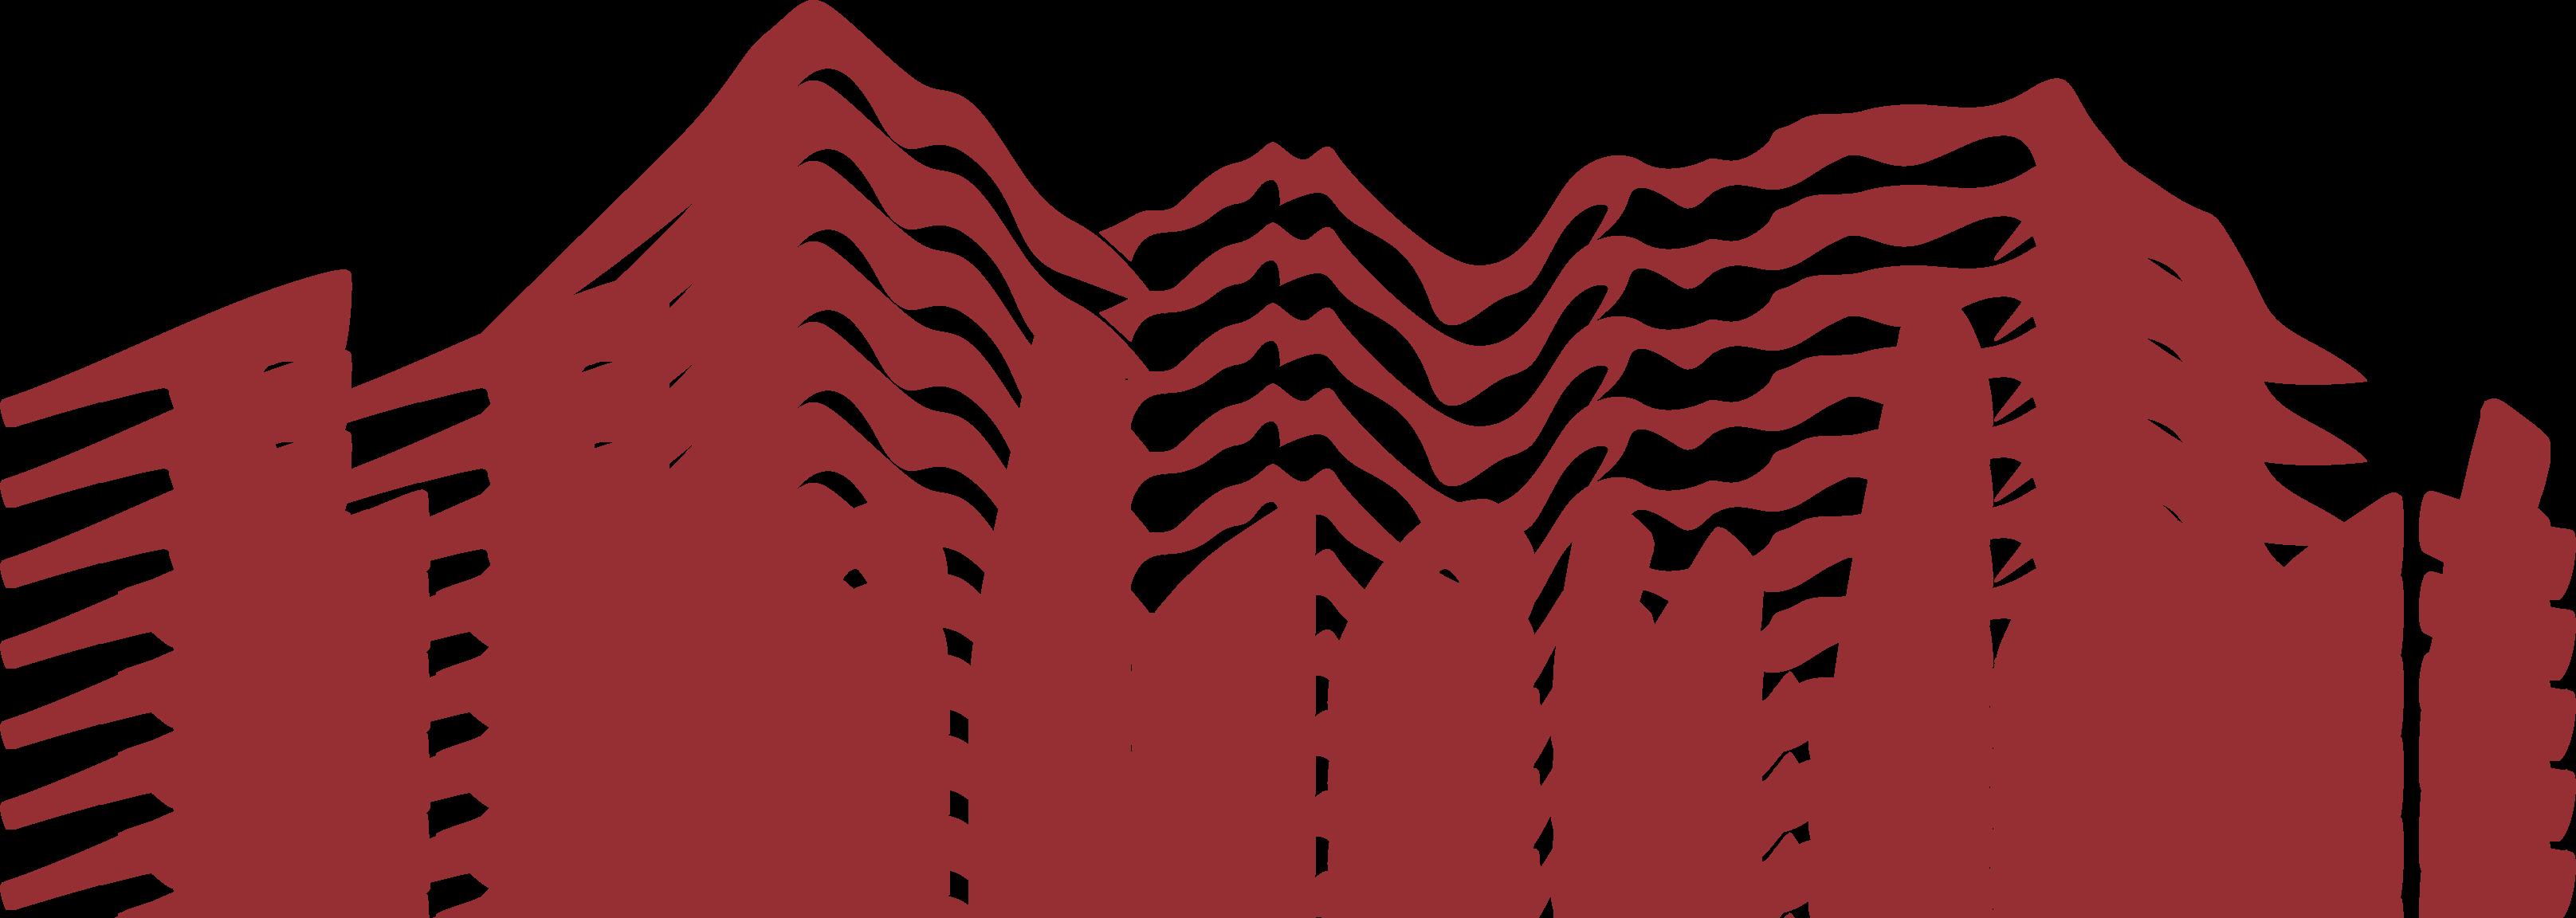 FFelsenfest